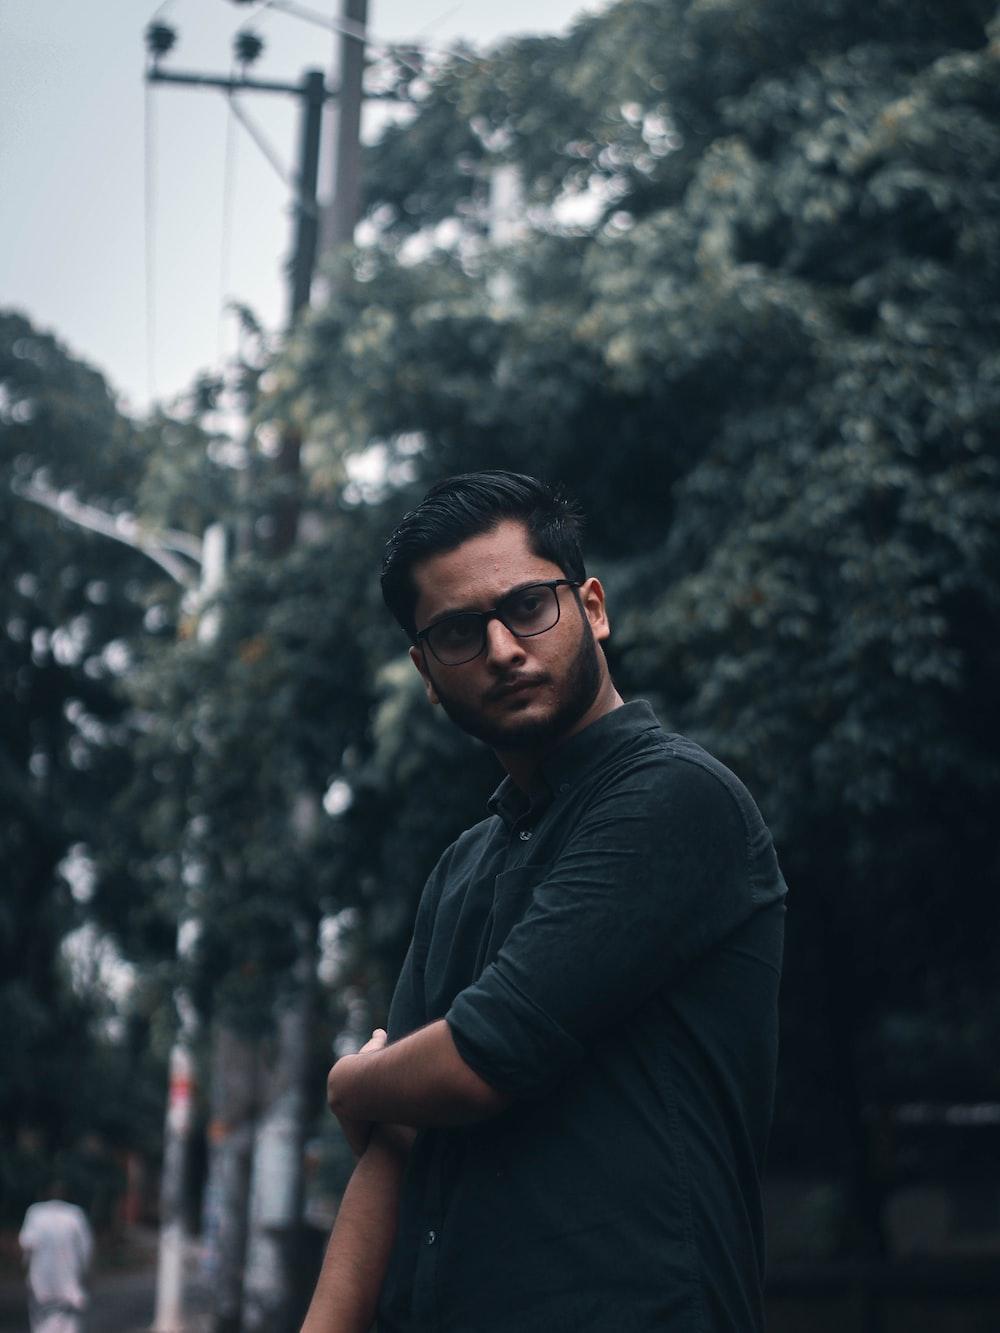 man in black long sleeve shirt wearing black sunglasses